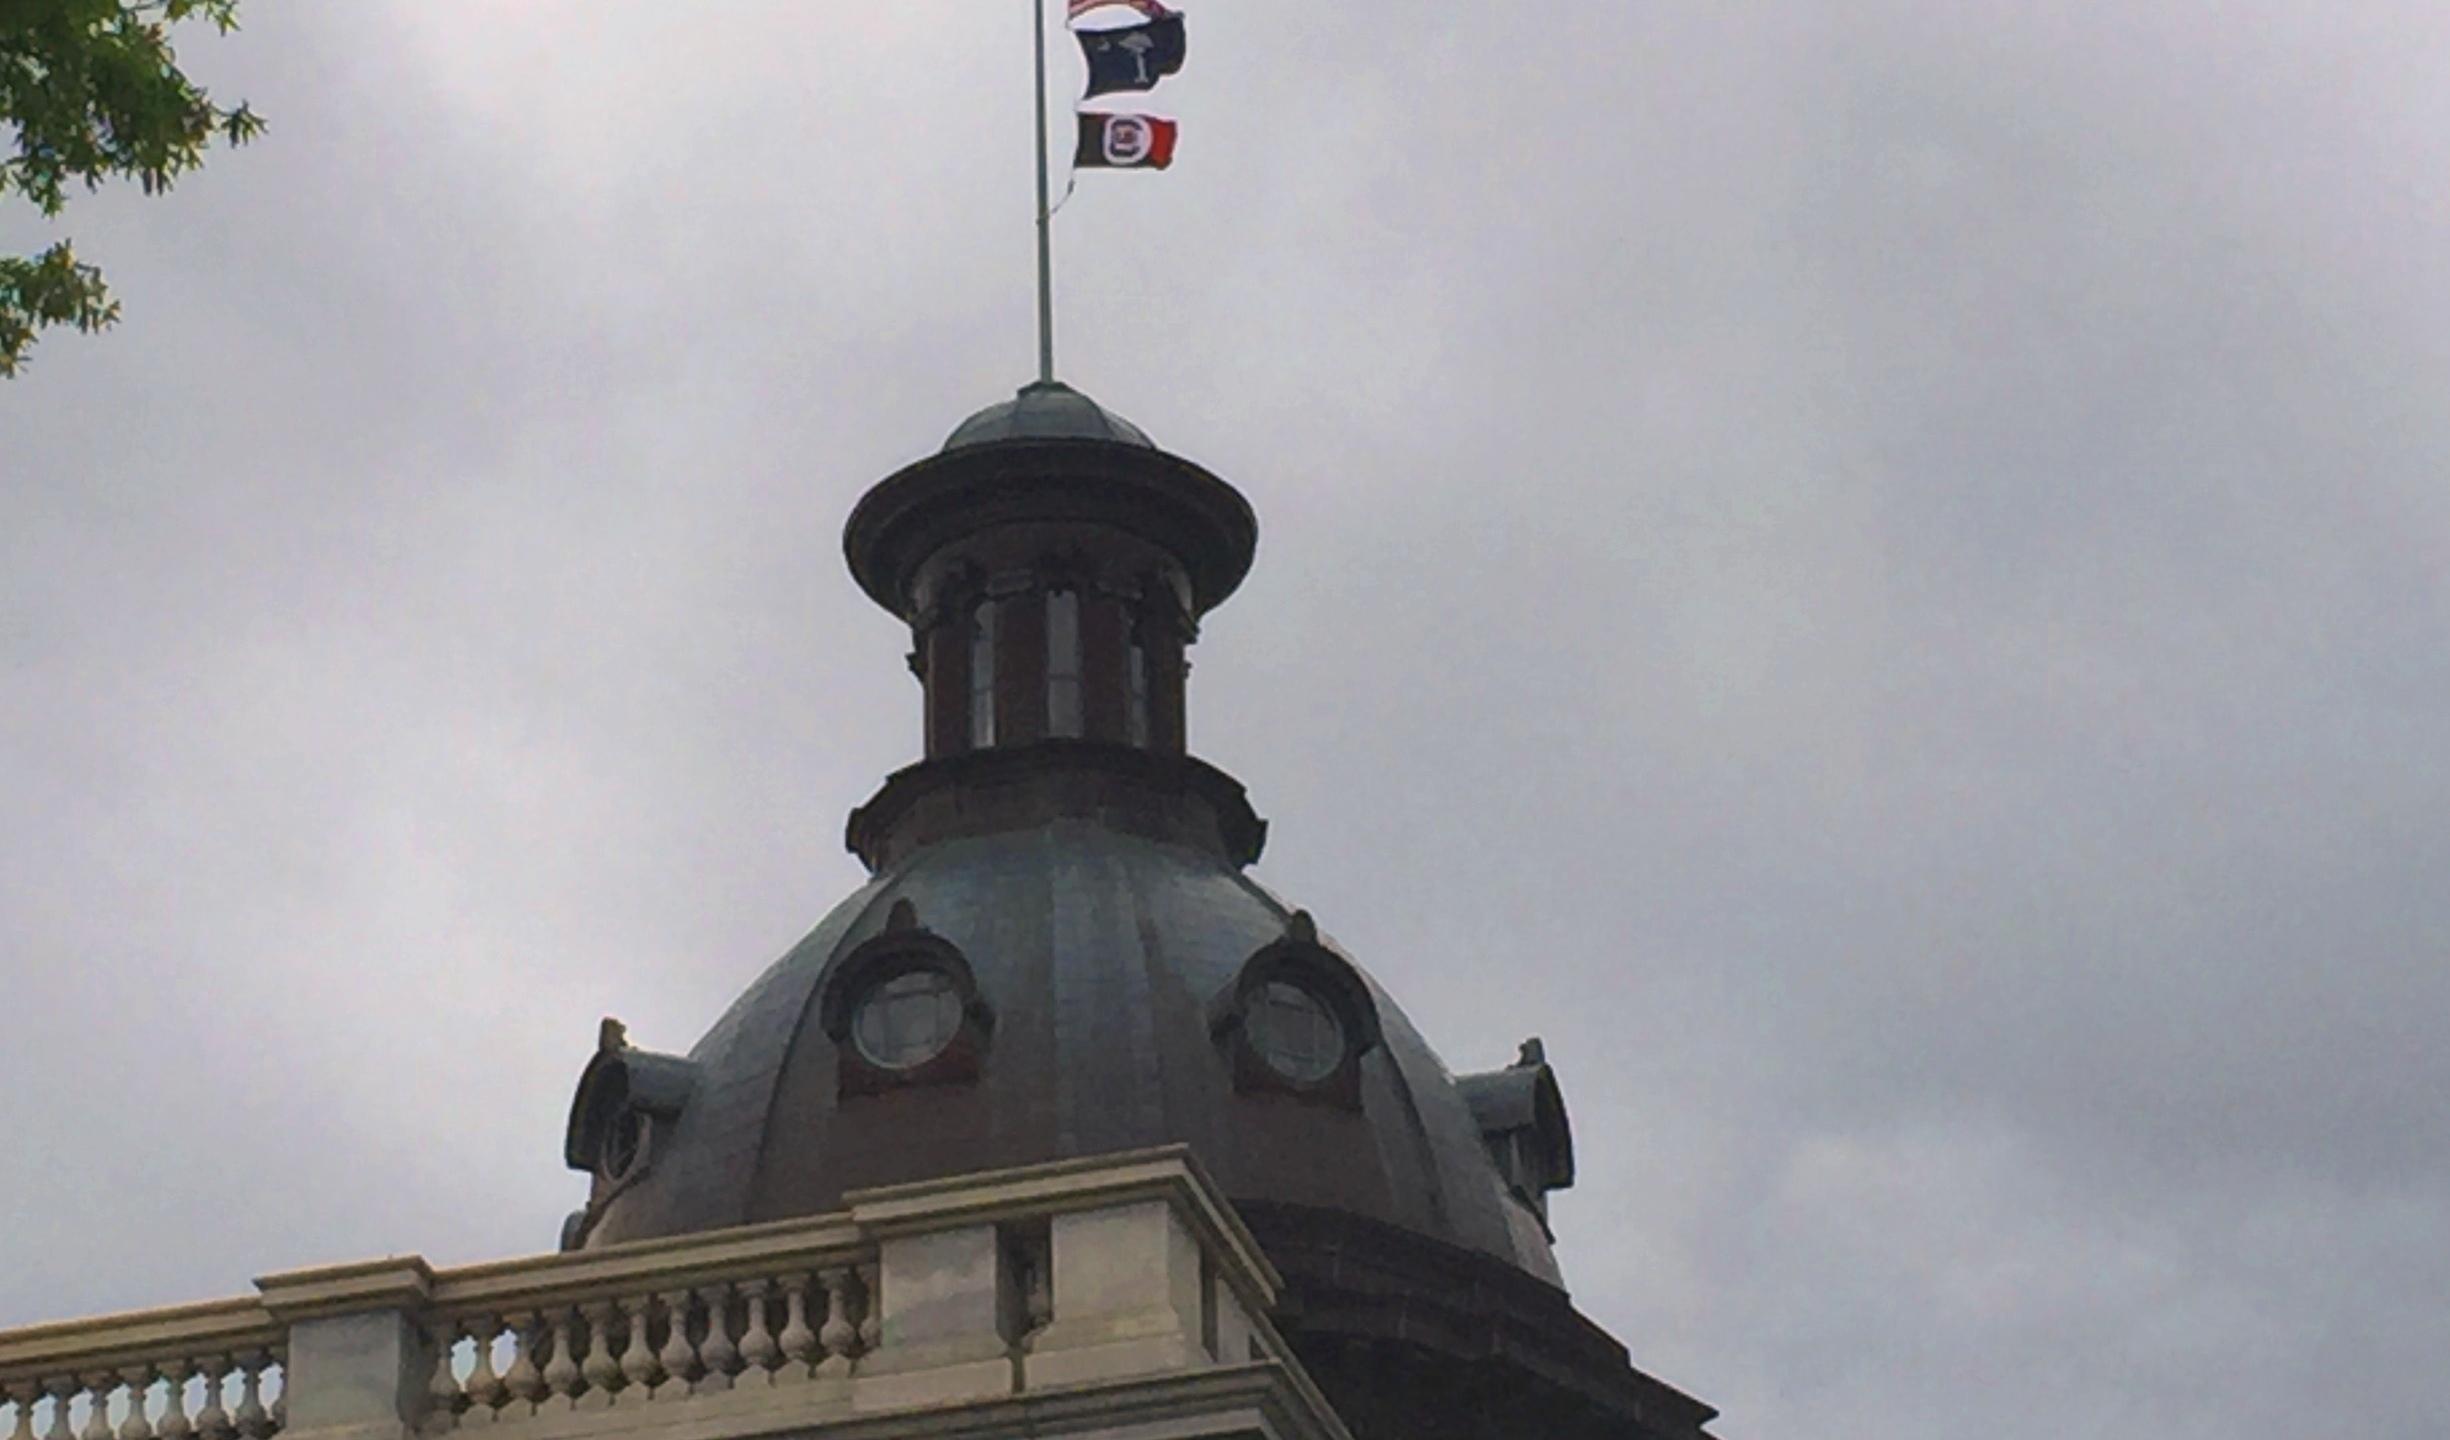 USC Flag on Statehouse edited_381887